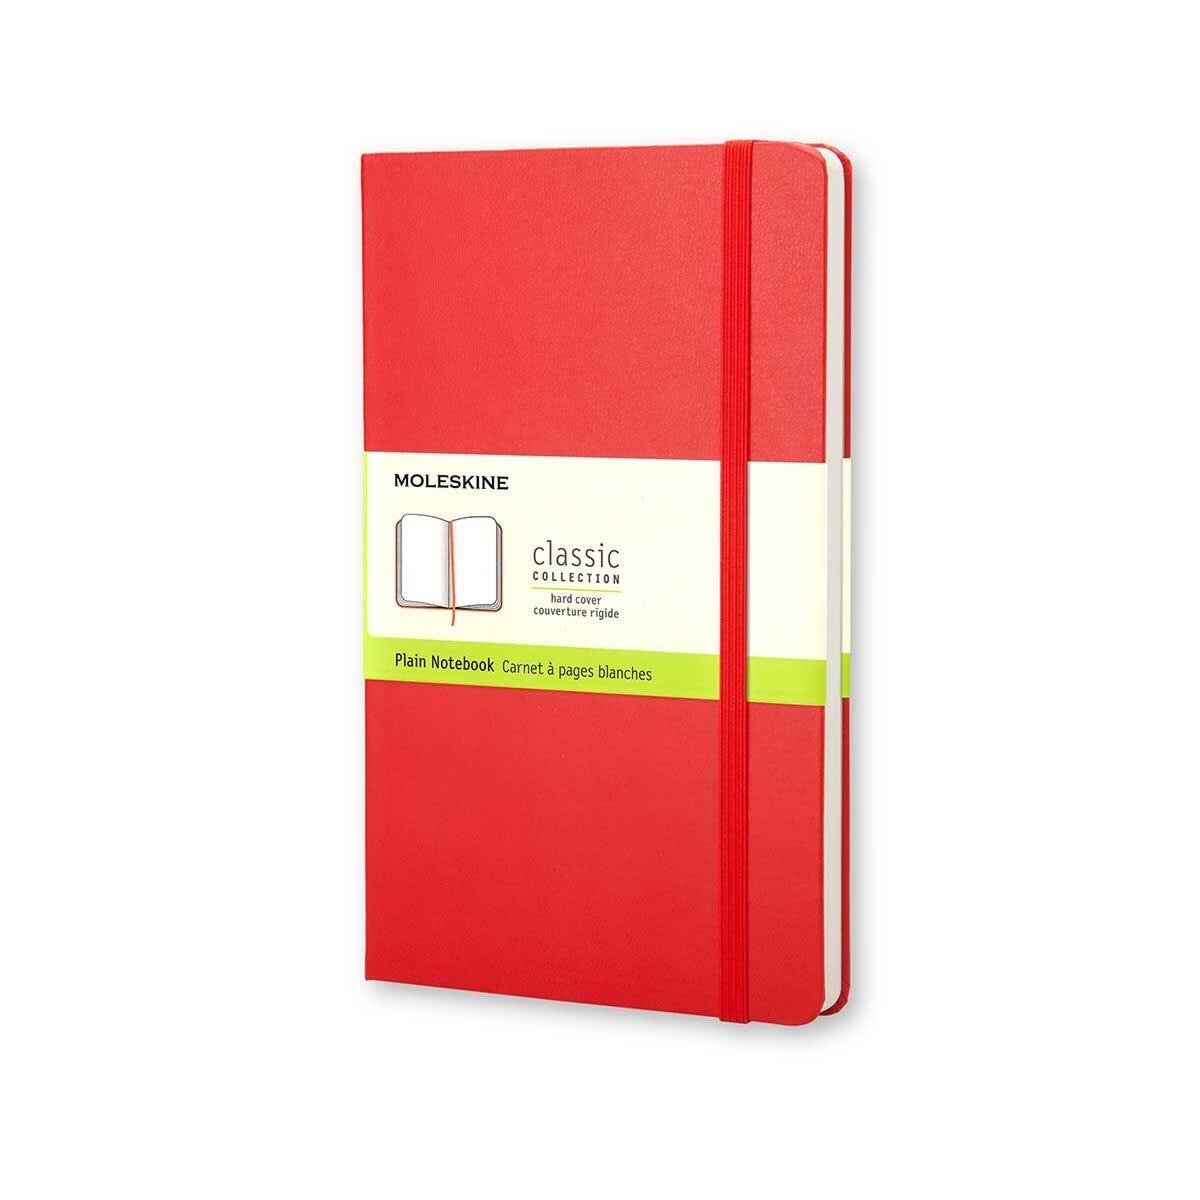 Moleskine Notebook Large Plain 210x130mm 240 Pages 120 Sheets